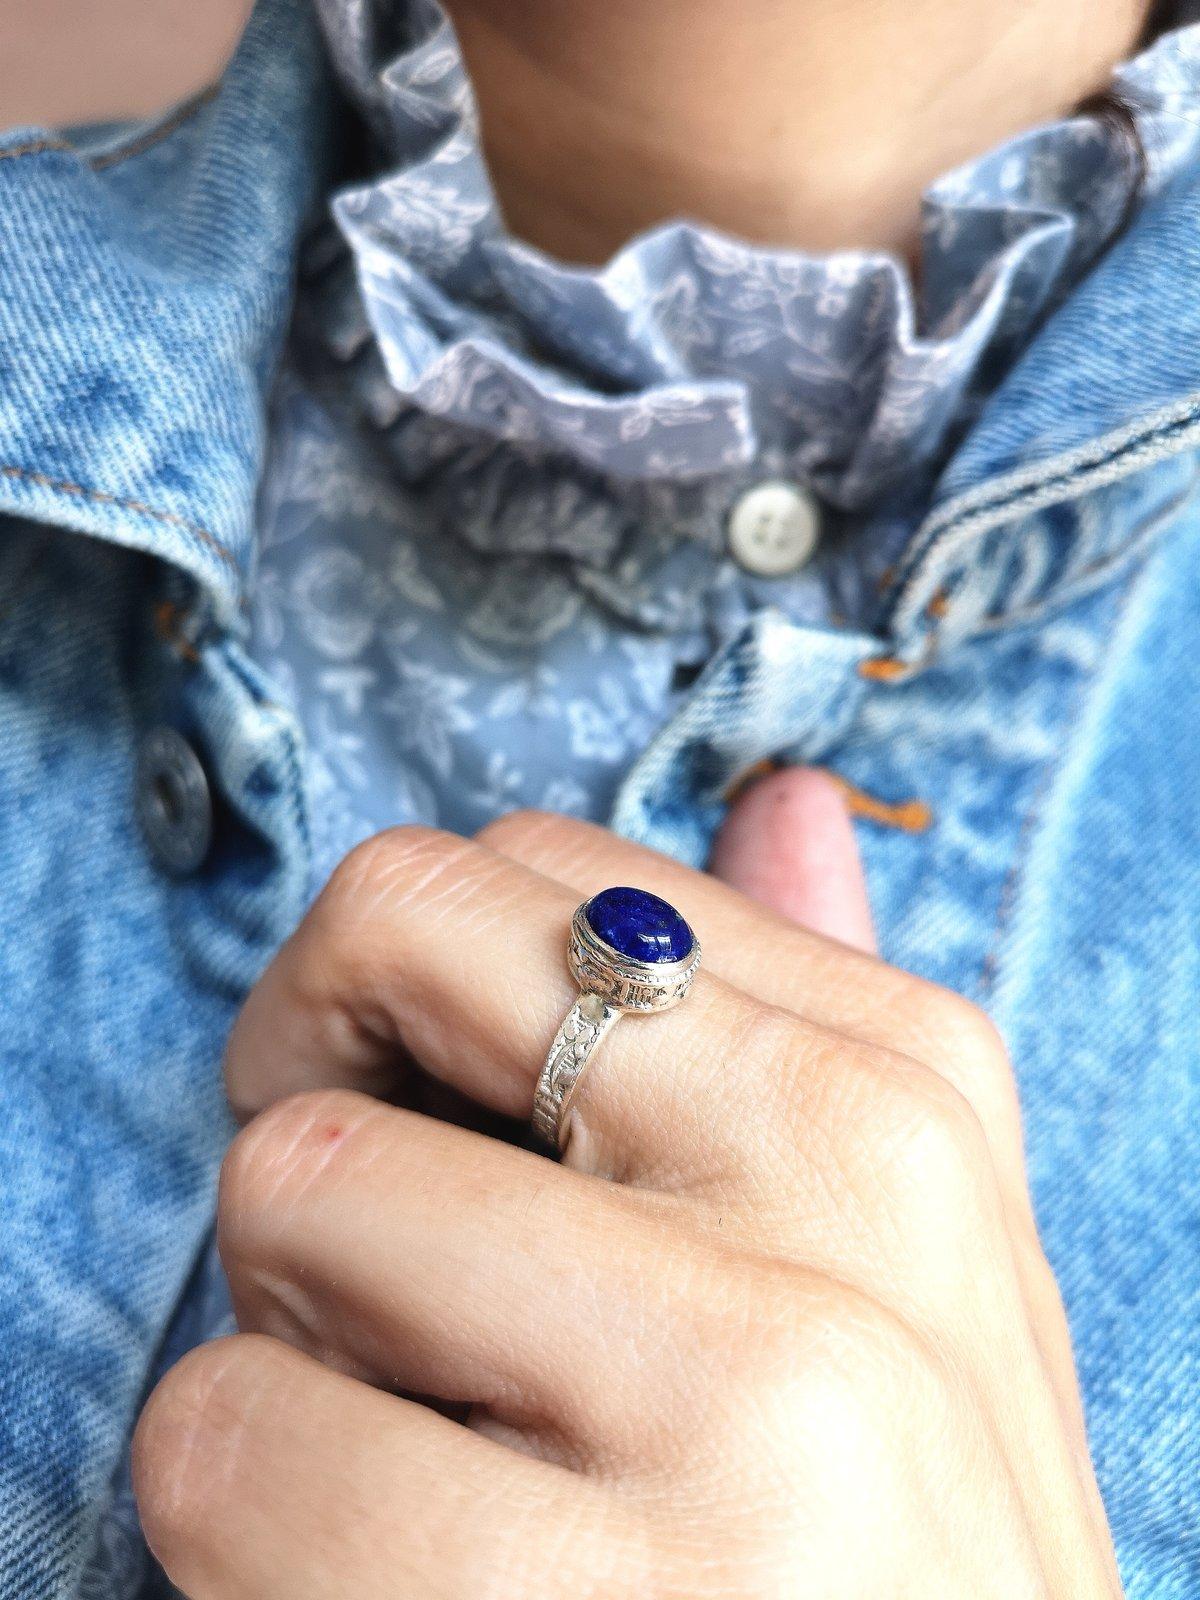 Image of Bague Lapis Lazuli - taille 55.5 - ref. 5437